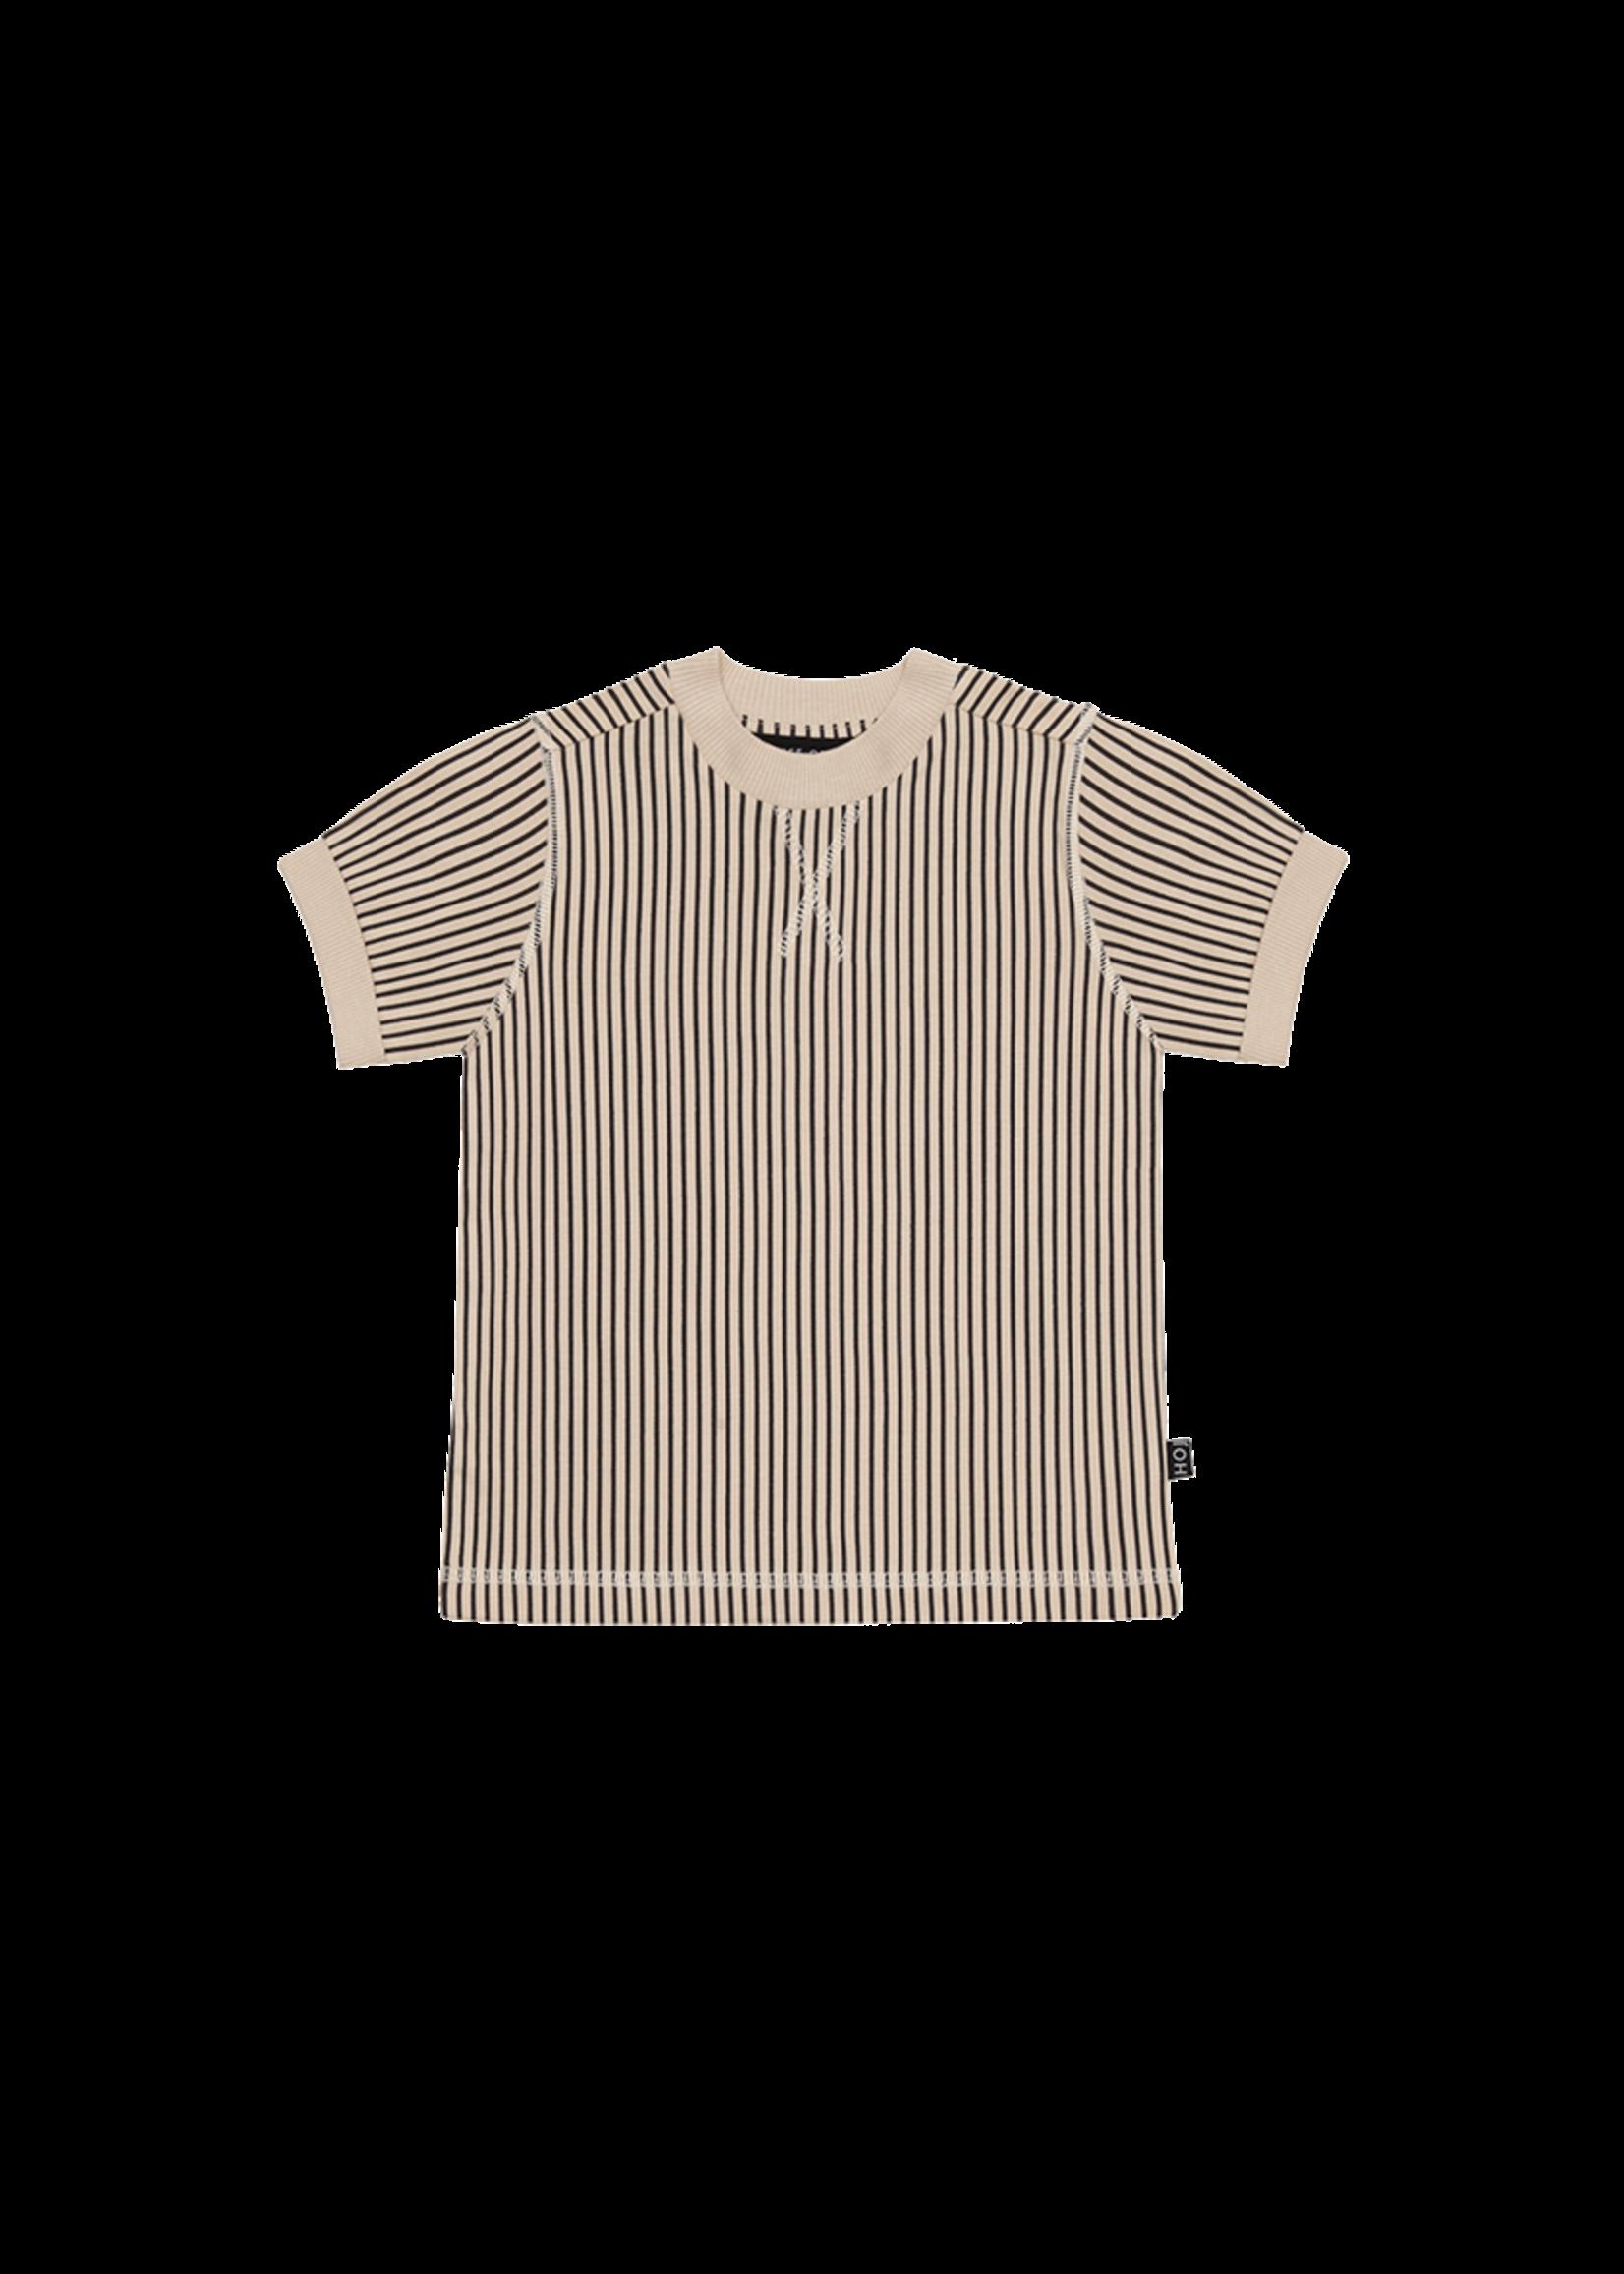 House of Jamie HOJ - Crewneck Tee Charcoal Sheer Stripes